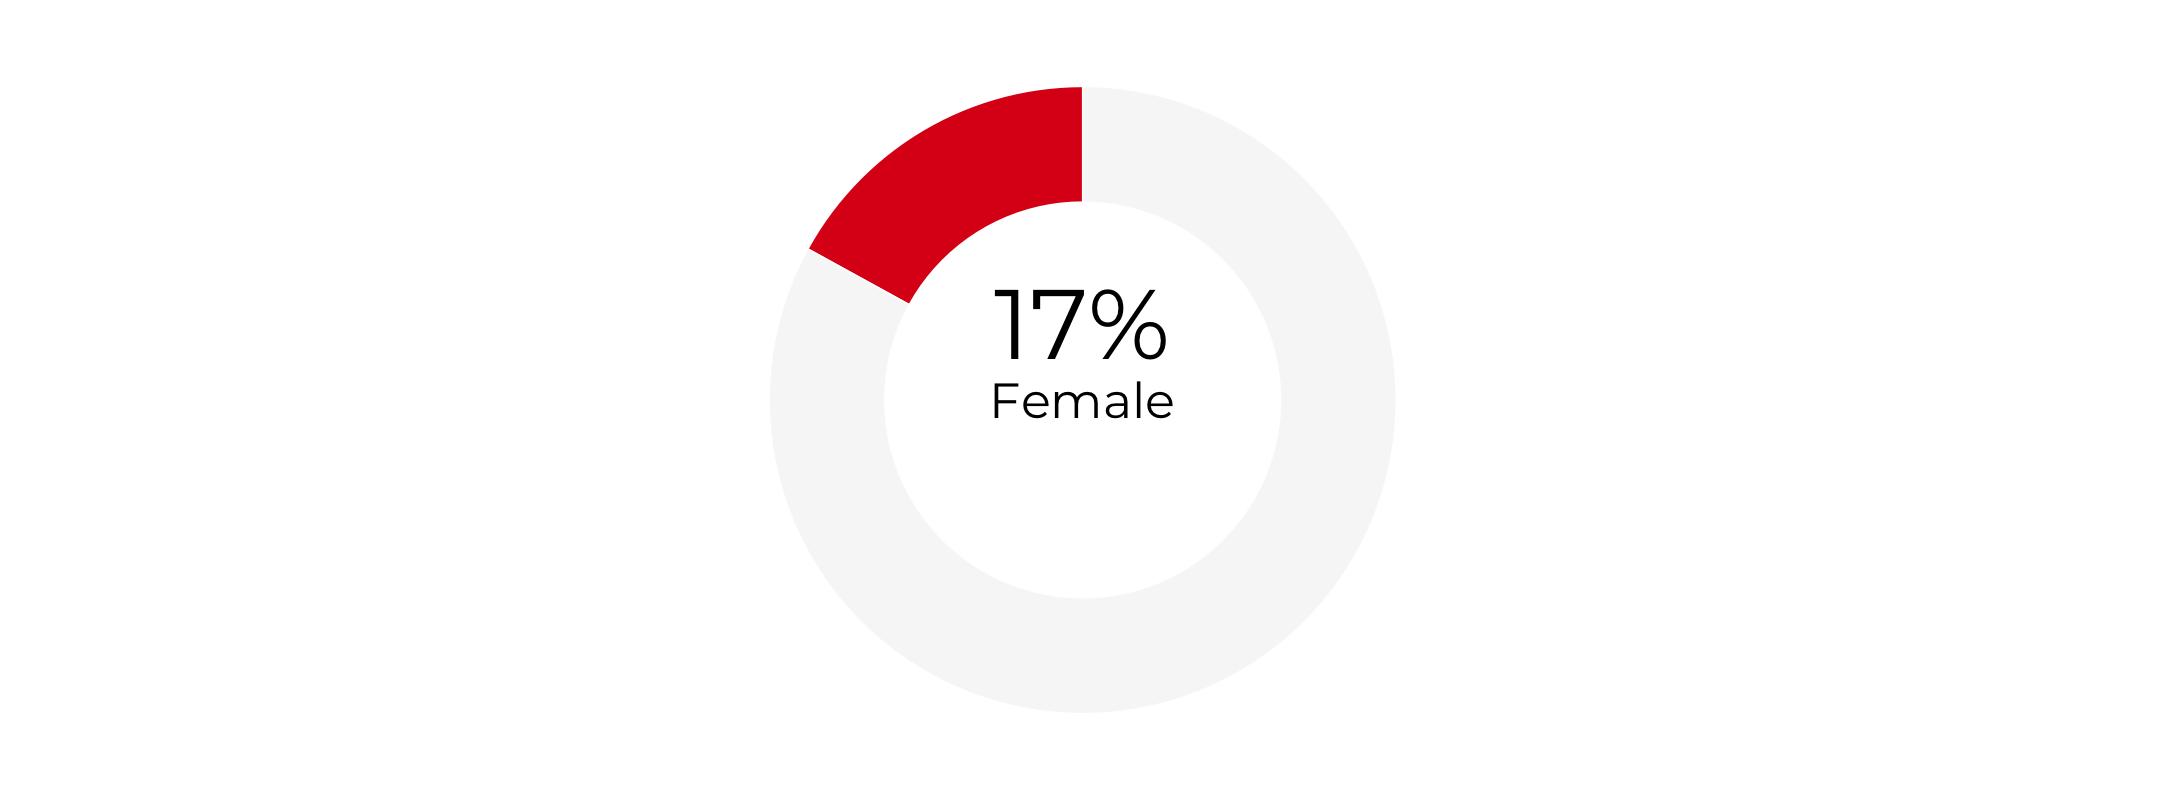 Graph about Gender Composition of Deputy Secretaries of Commerce. More detailed text description below.